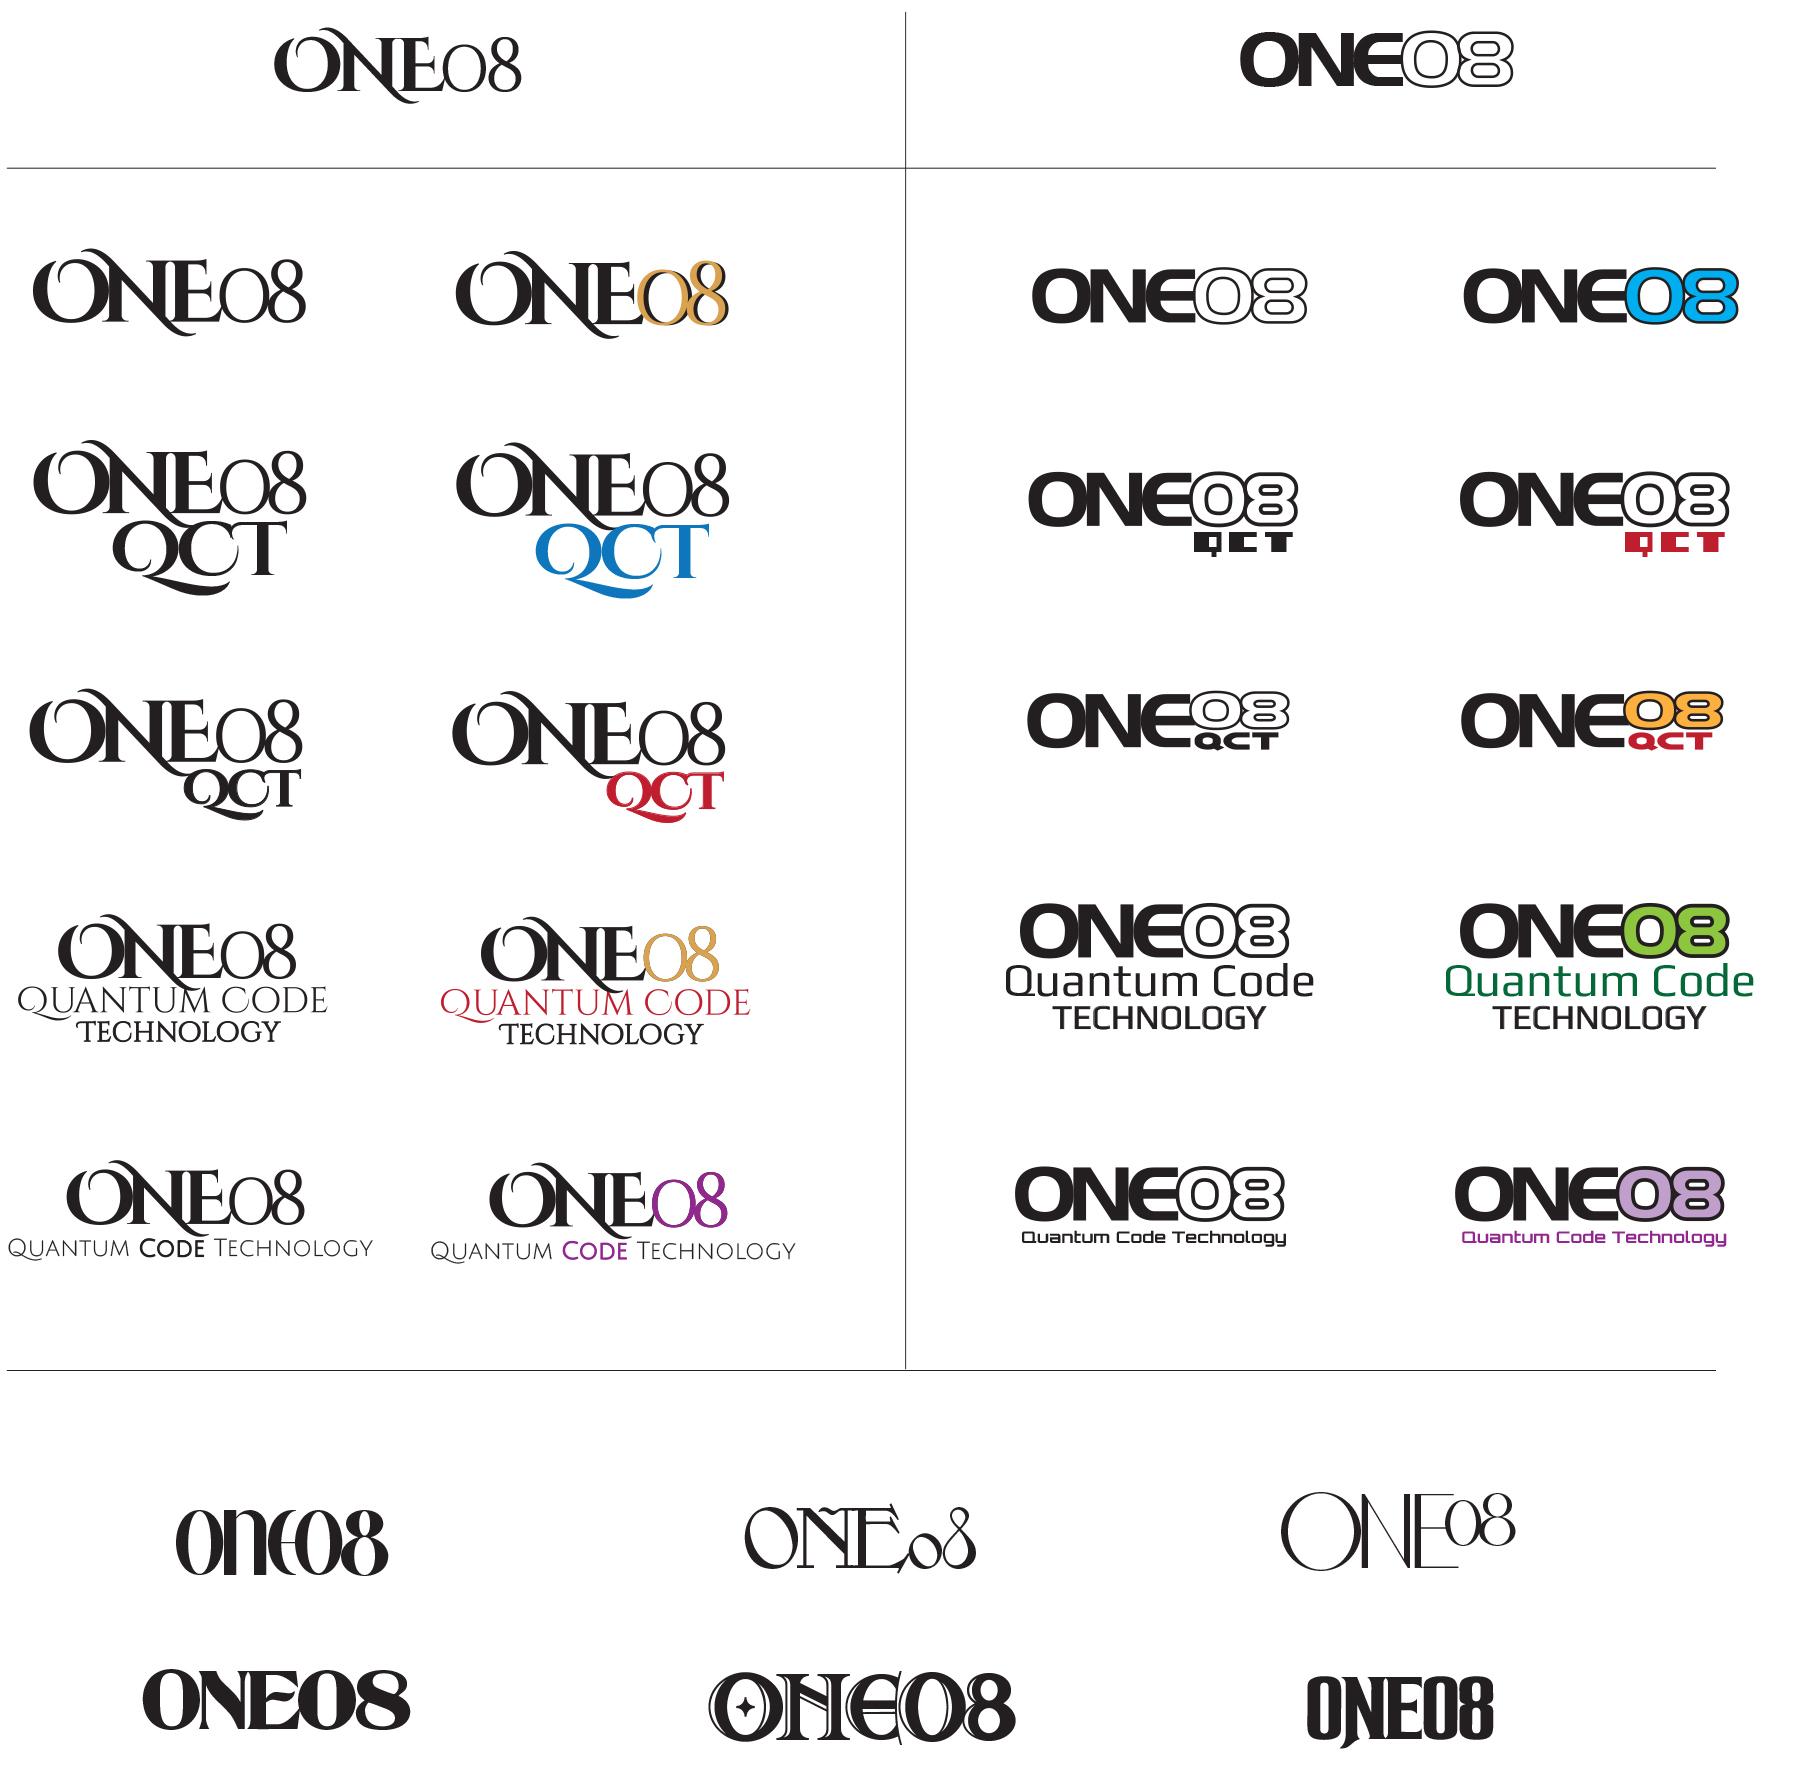 One08 Logo Design